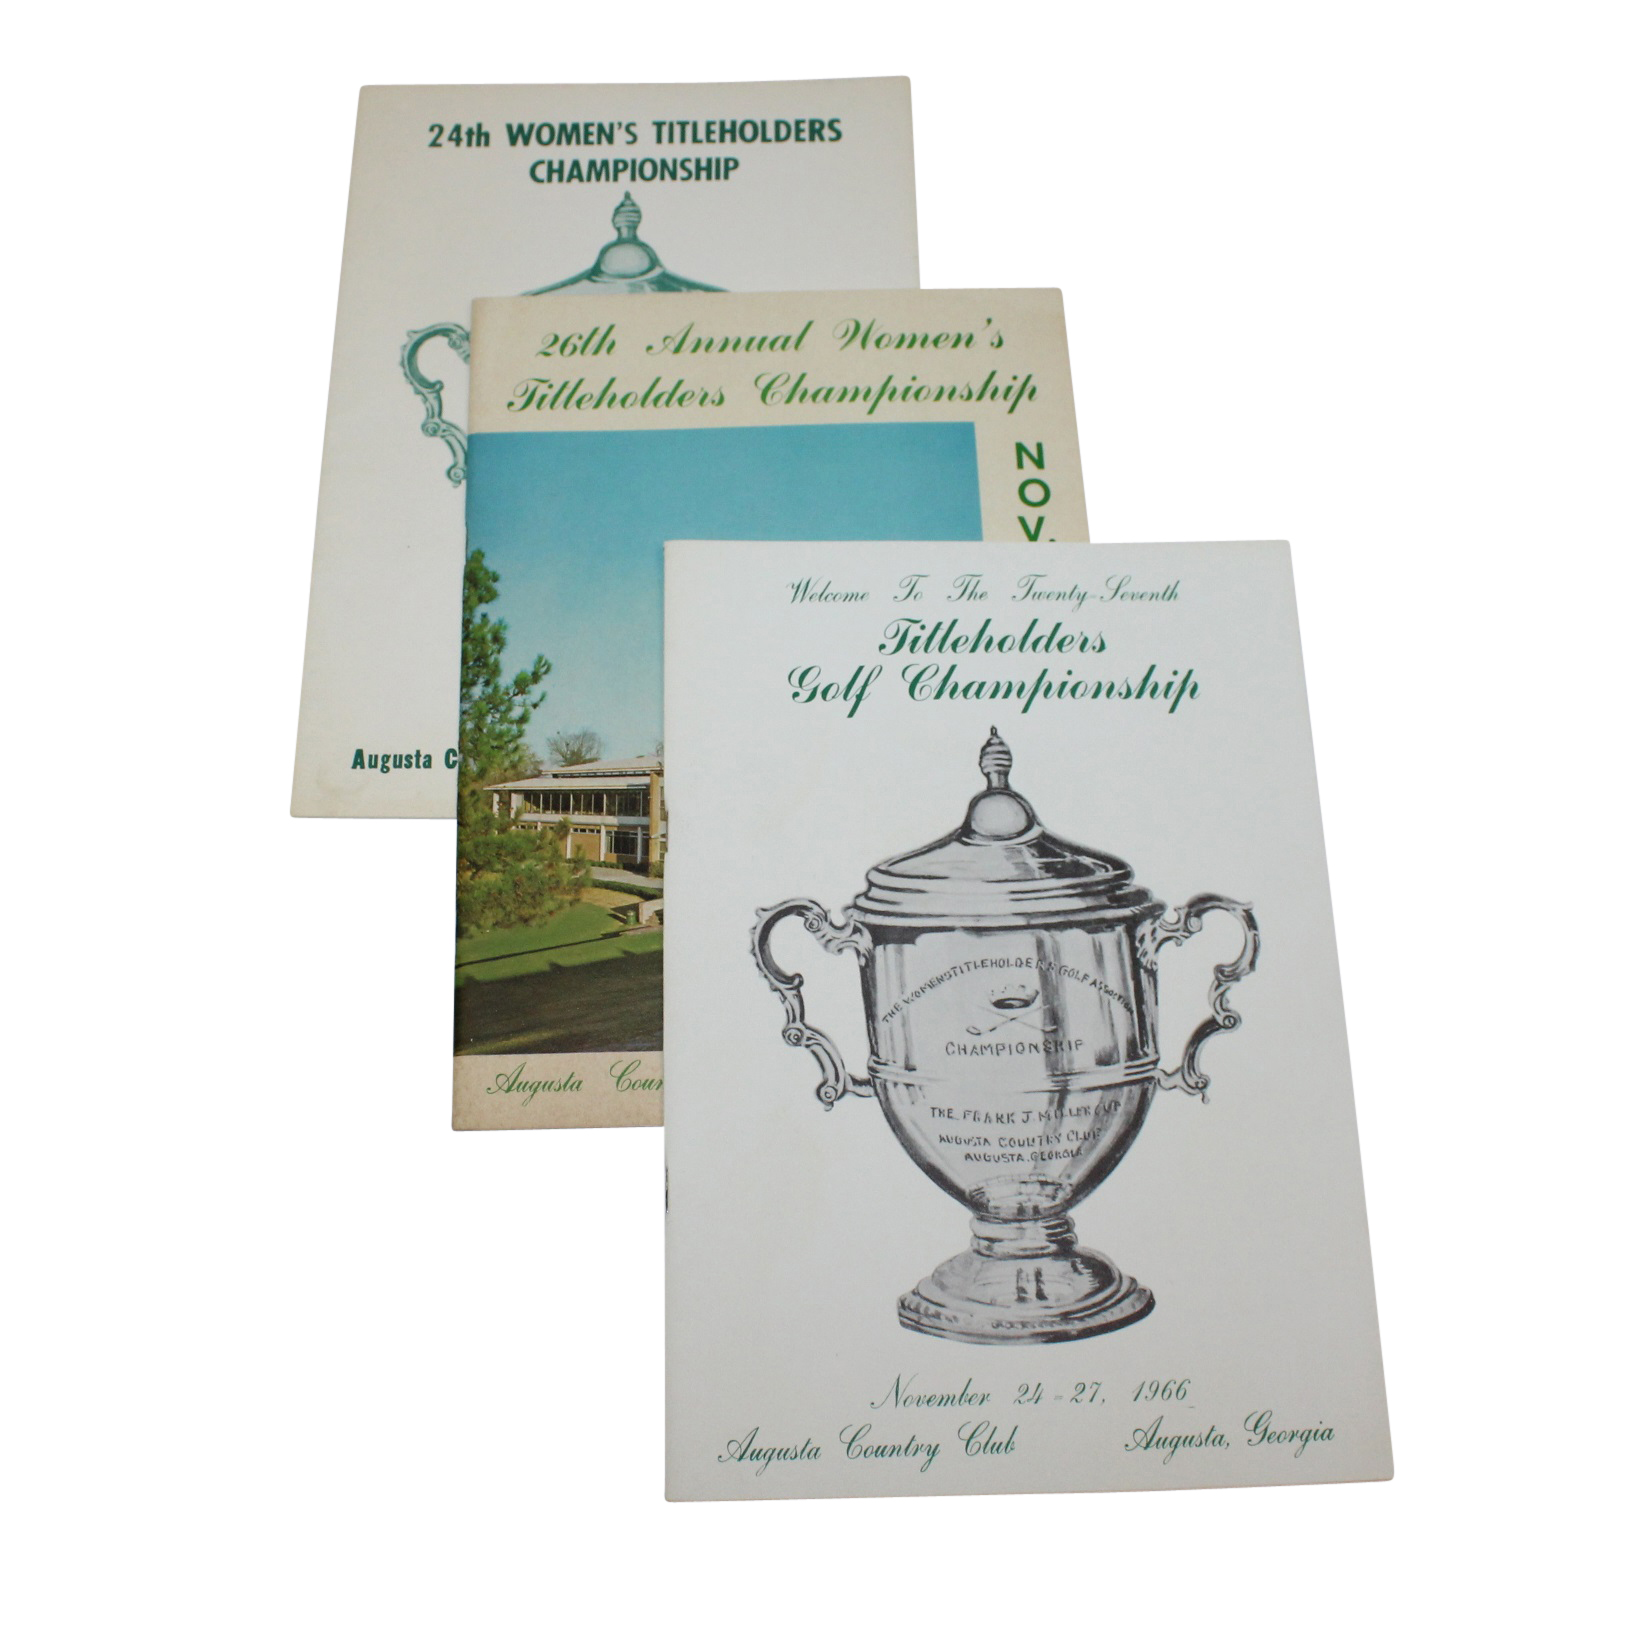 Kathy Whitworth Invitational with beautiful invitations layout